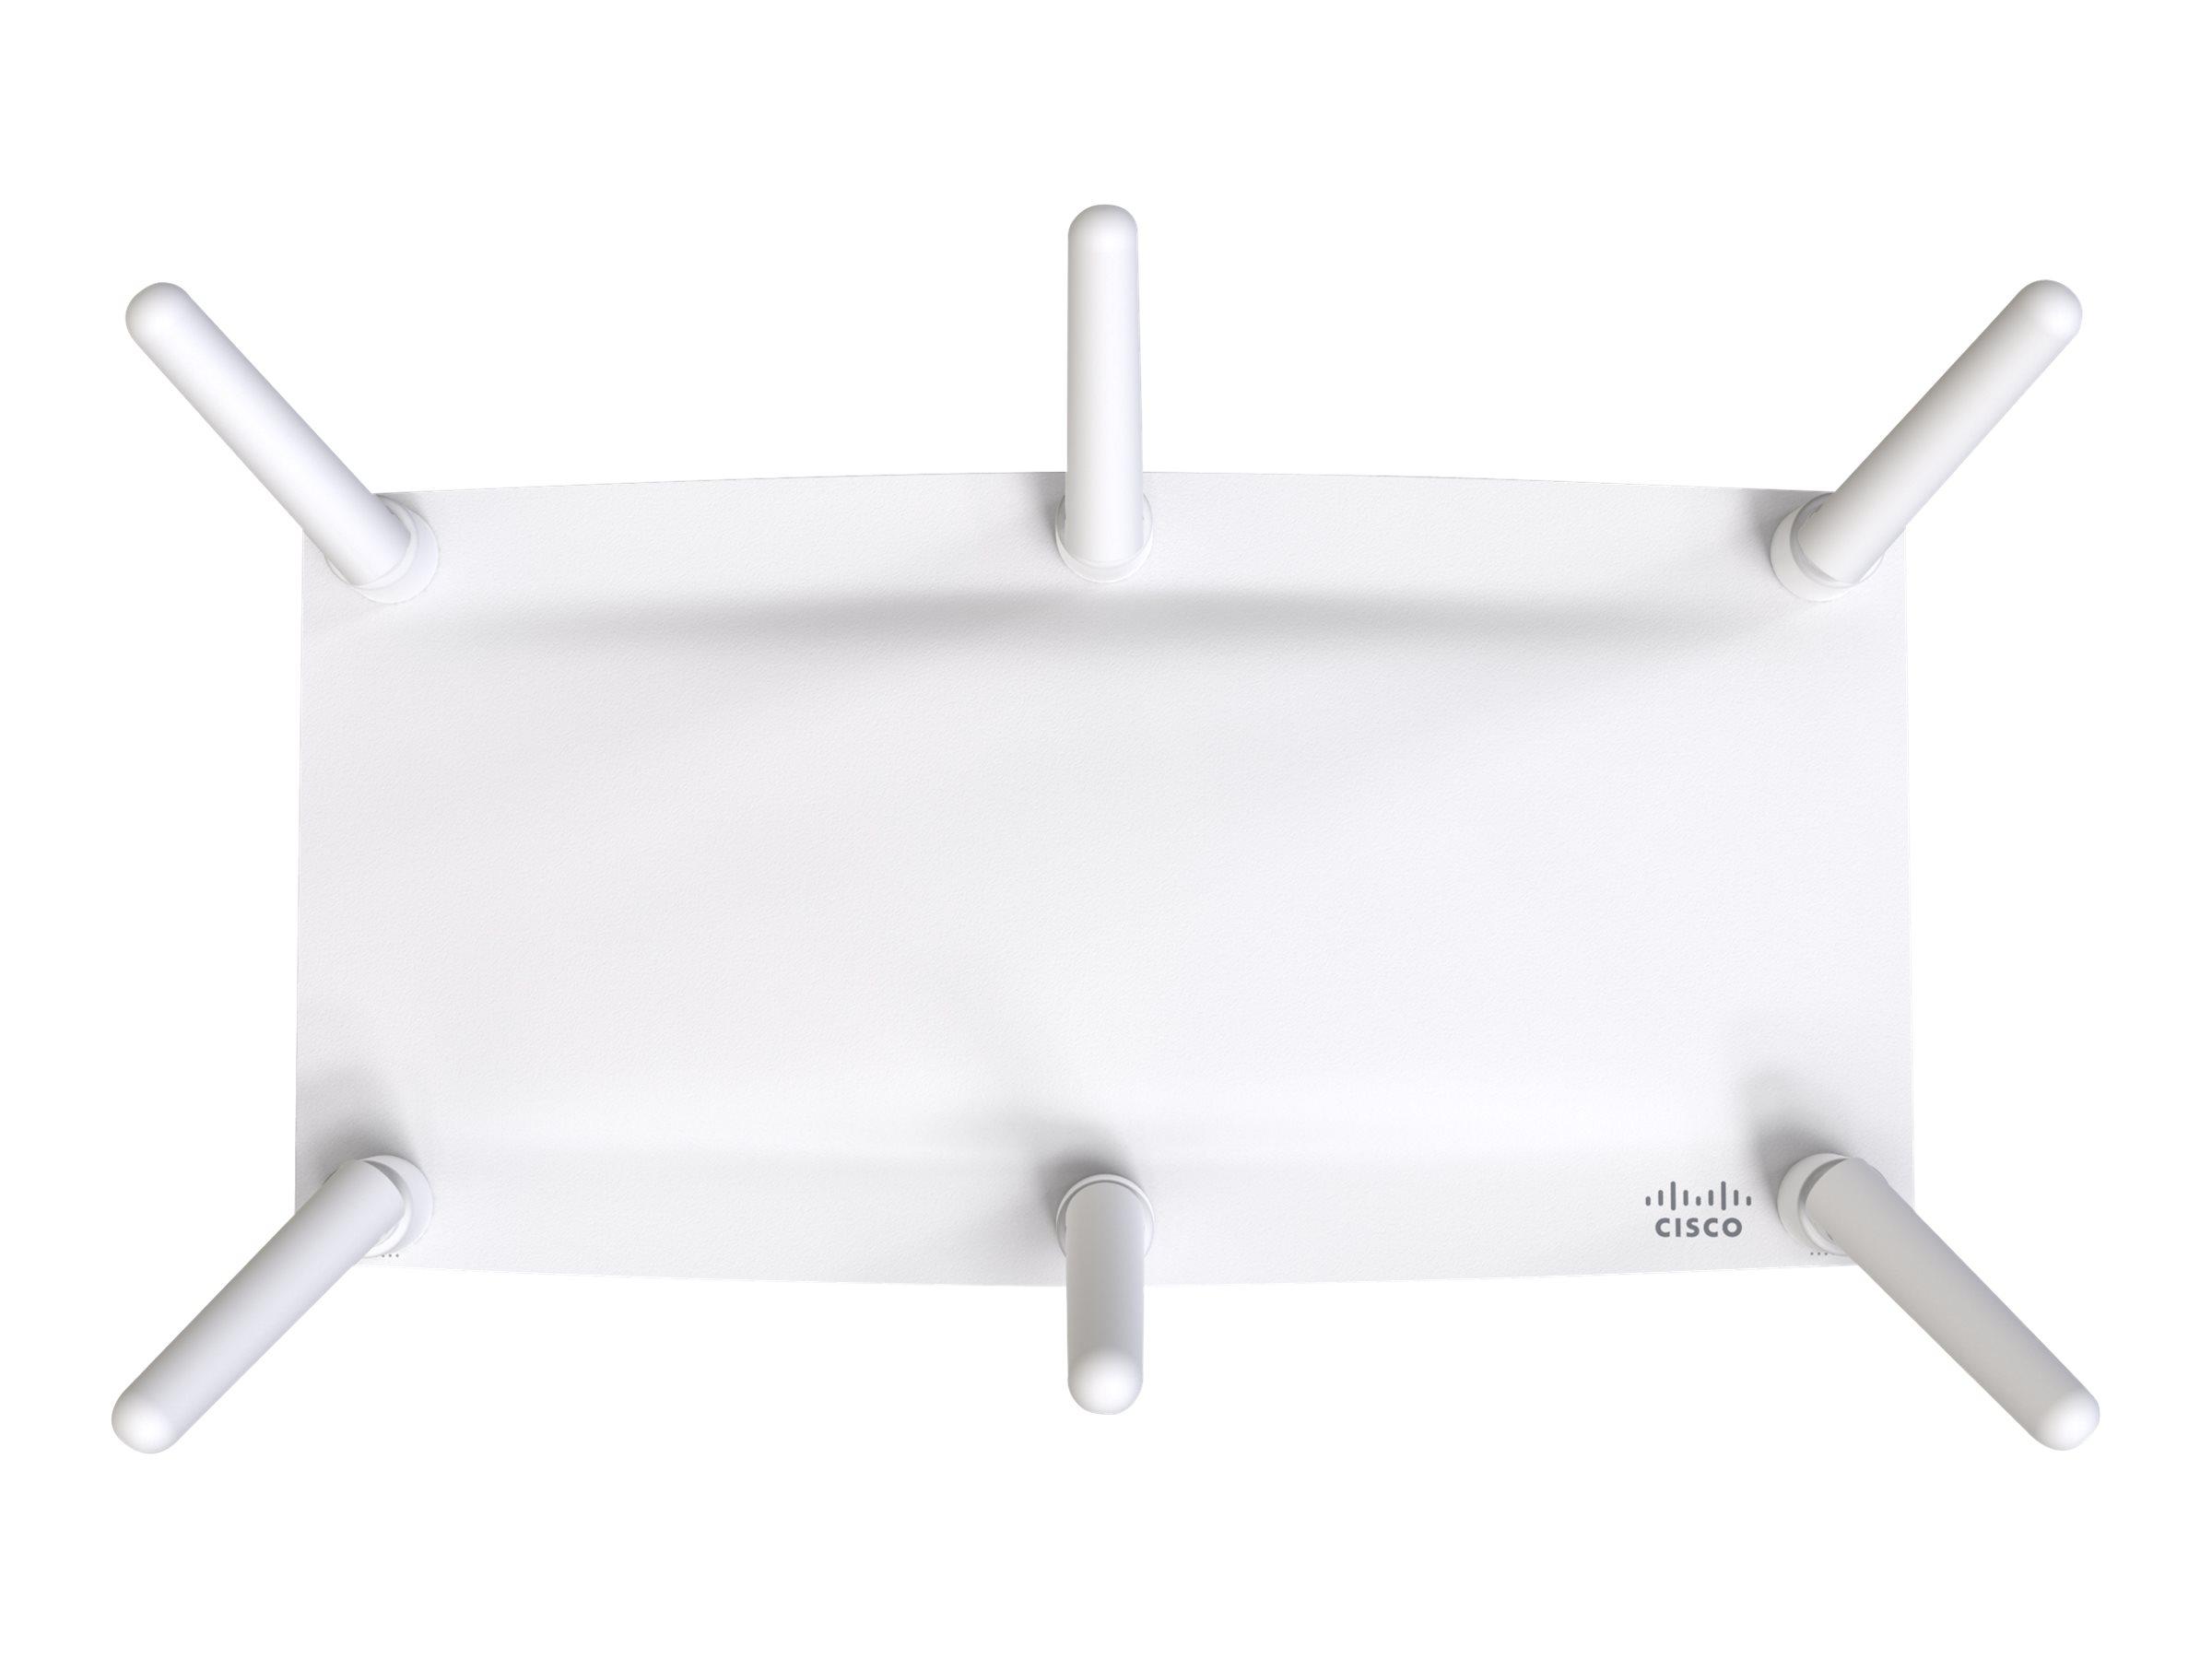 Cisco Meraki MR46E - Funkbasisstation - 802.11ac Wave 2, 802.11ax - Wi-Fi - Dualband